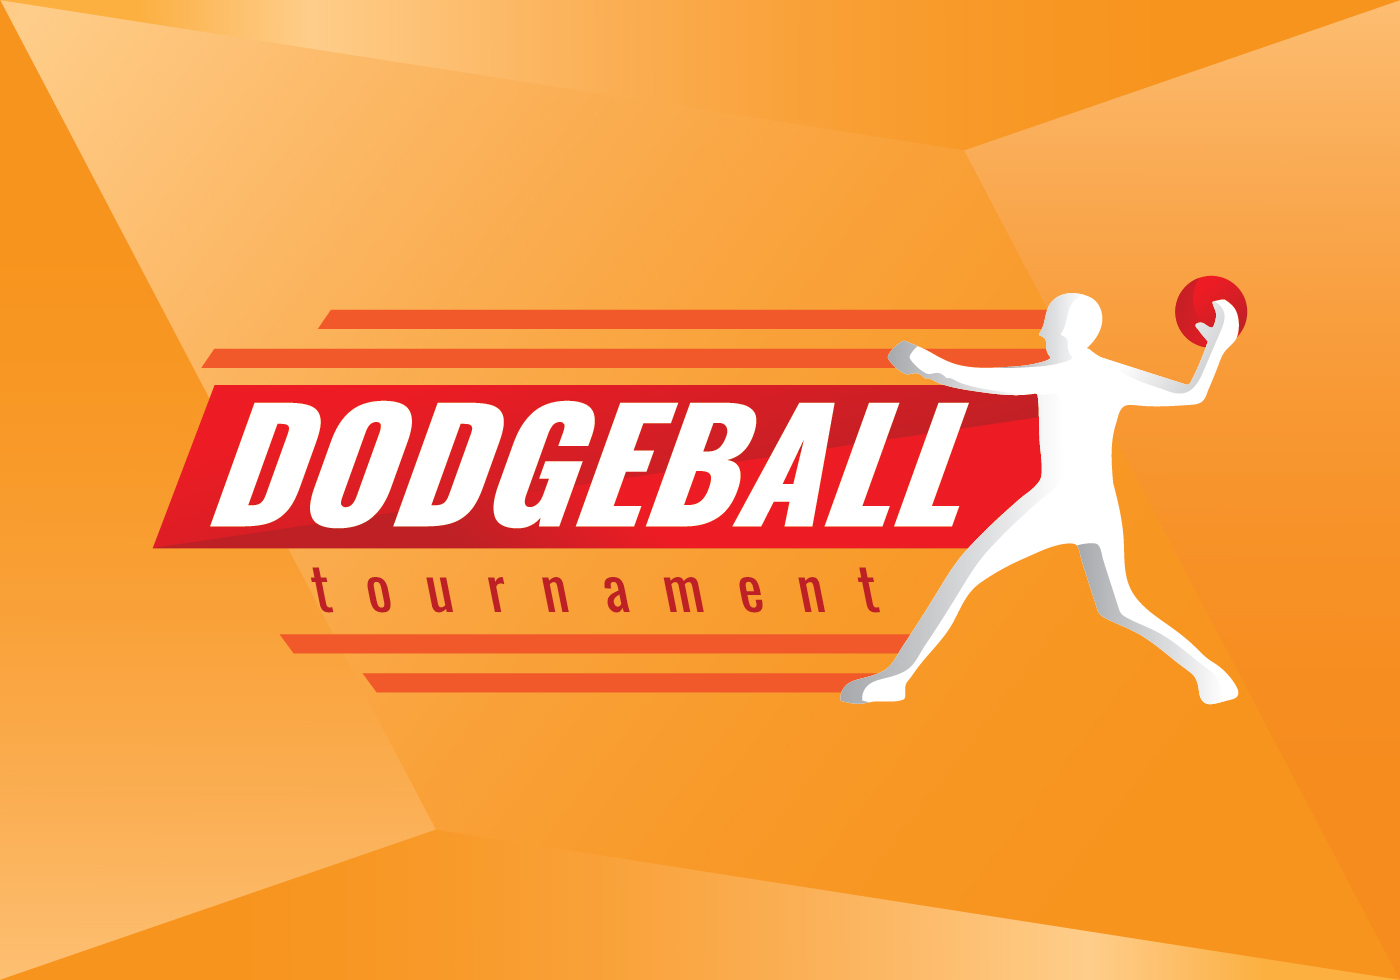 Free Dodgeball Tournament Vector Logo - Download Free Vector Art, Stock Graphics & Images